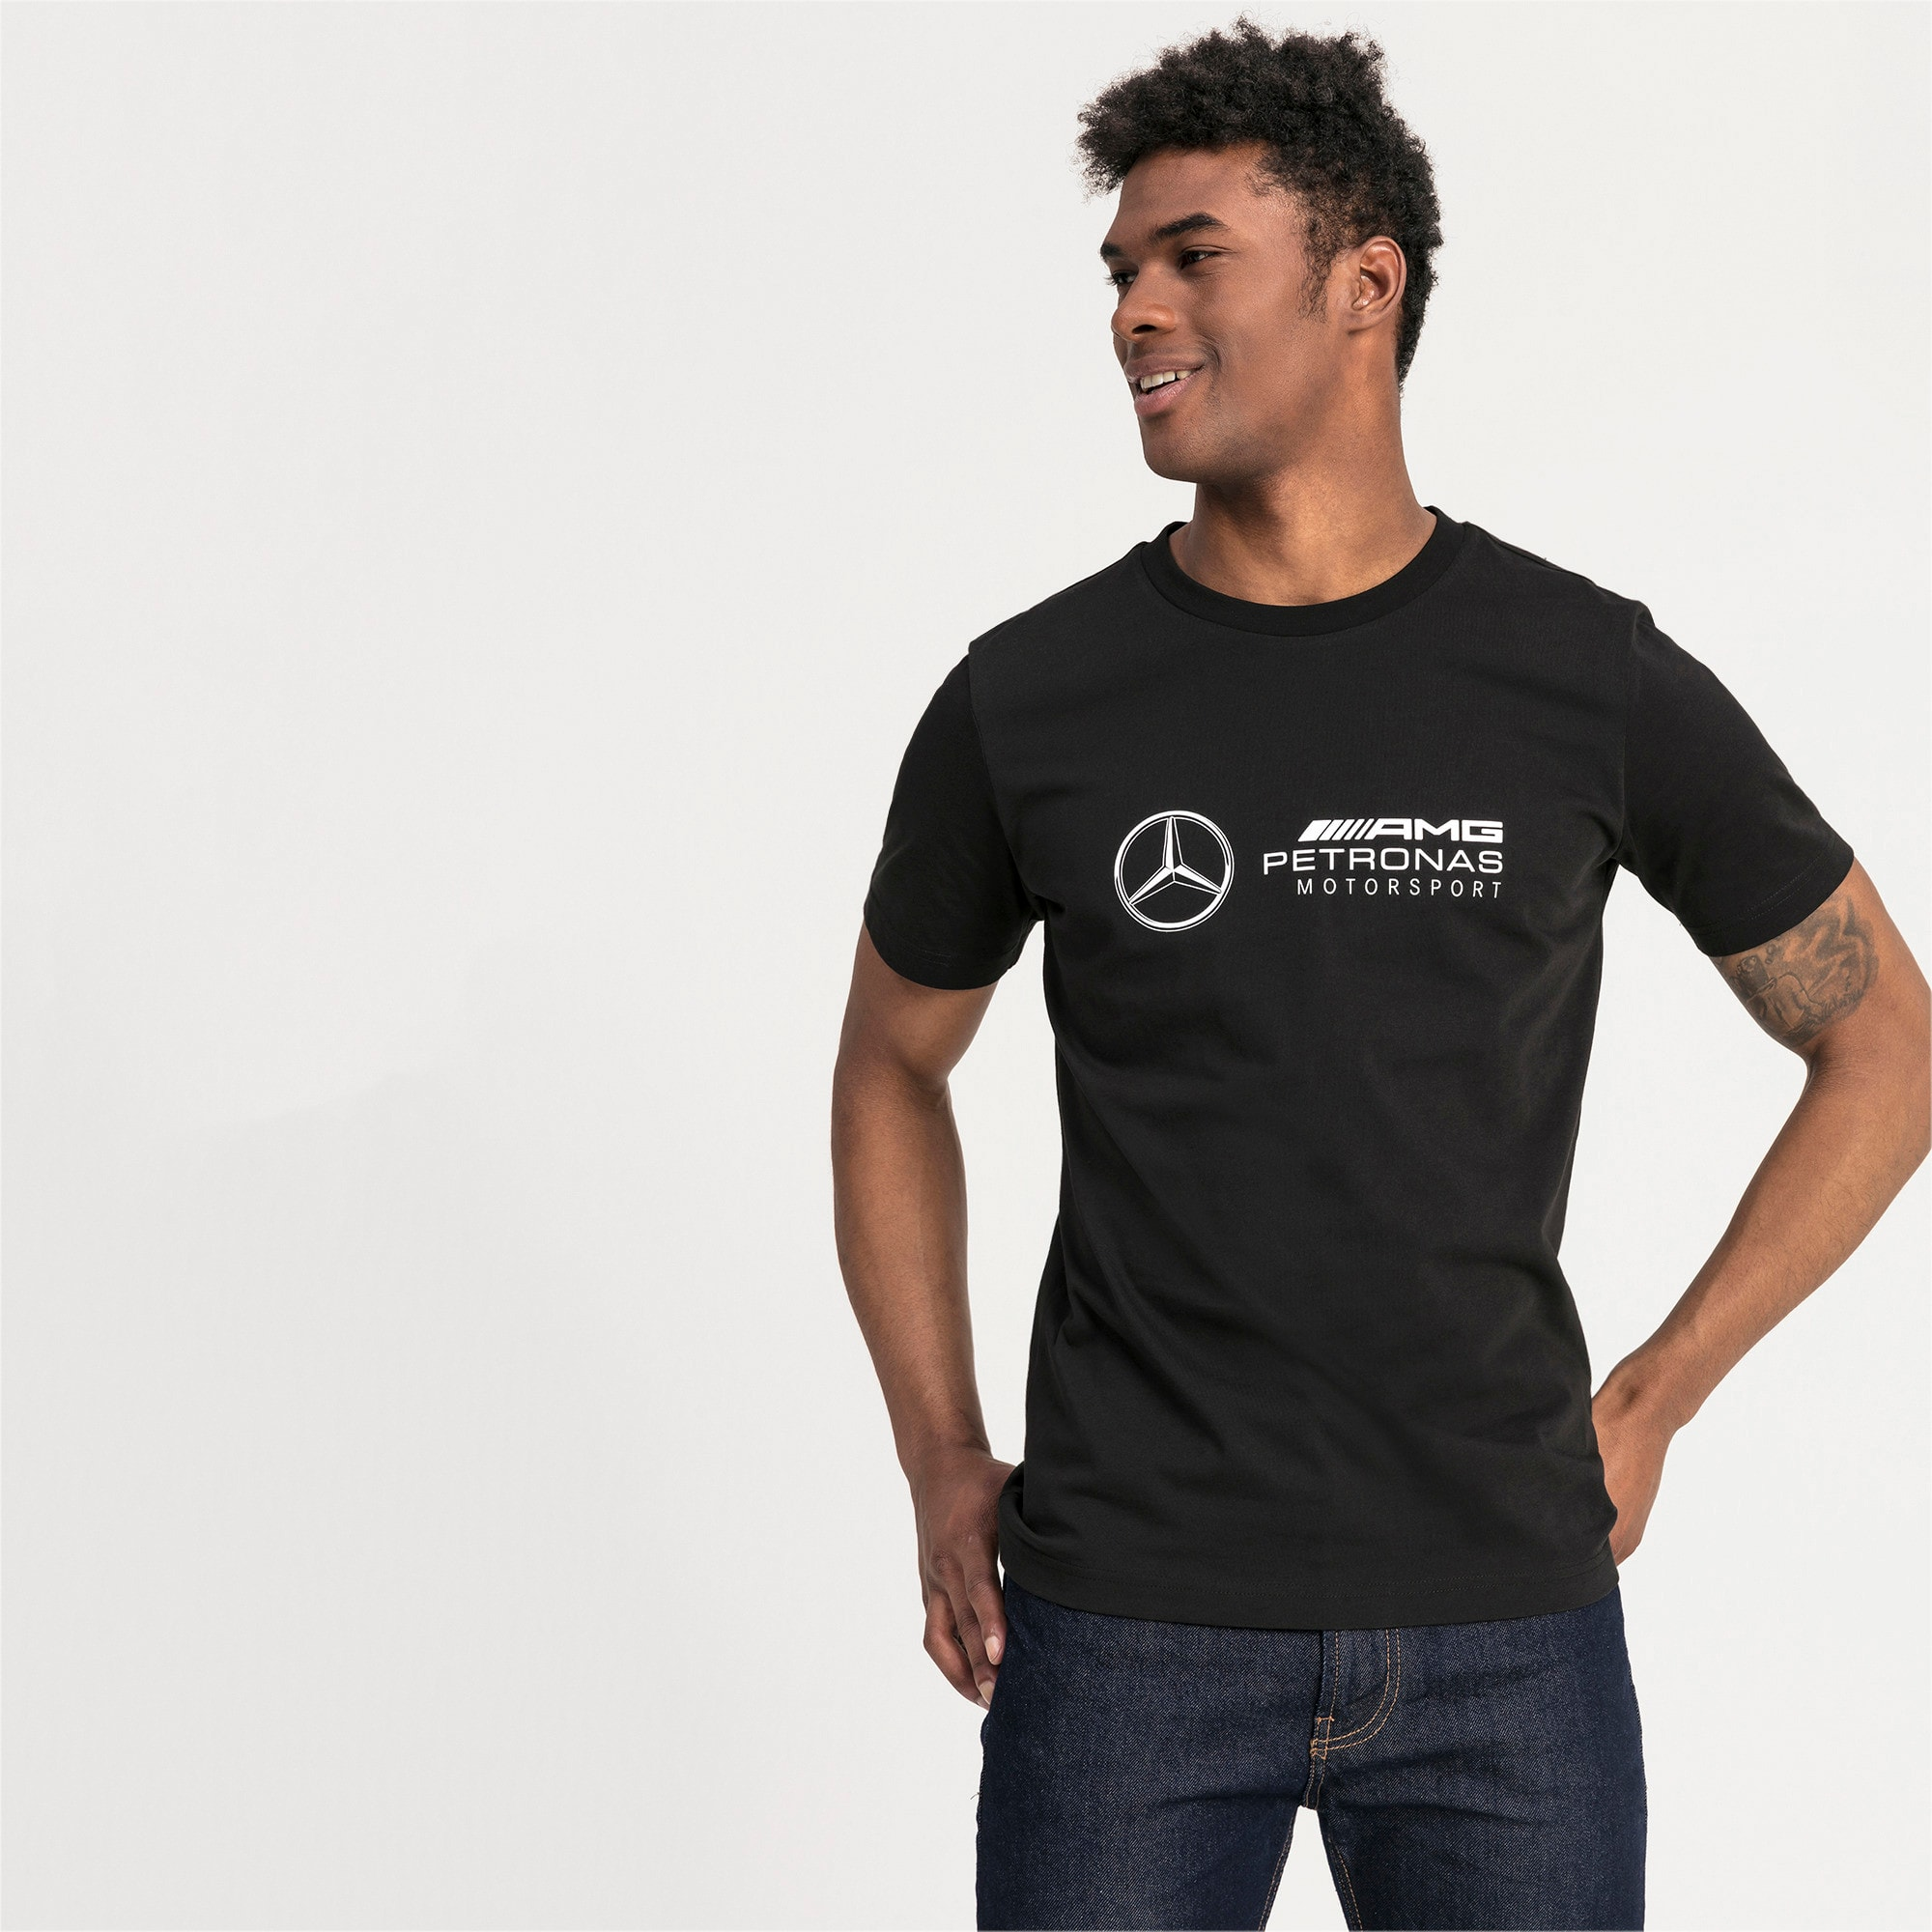 Thumbnail 1 of Mercedes AMG Petronas Short Sleeve Men's Tee, Puma Black, medium